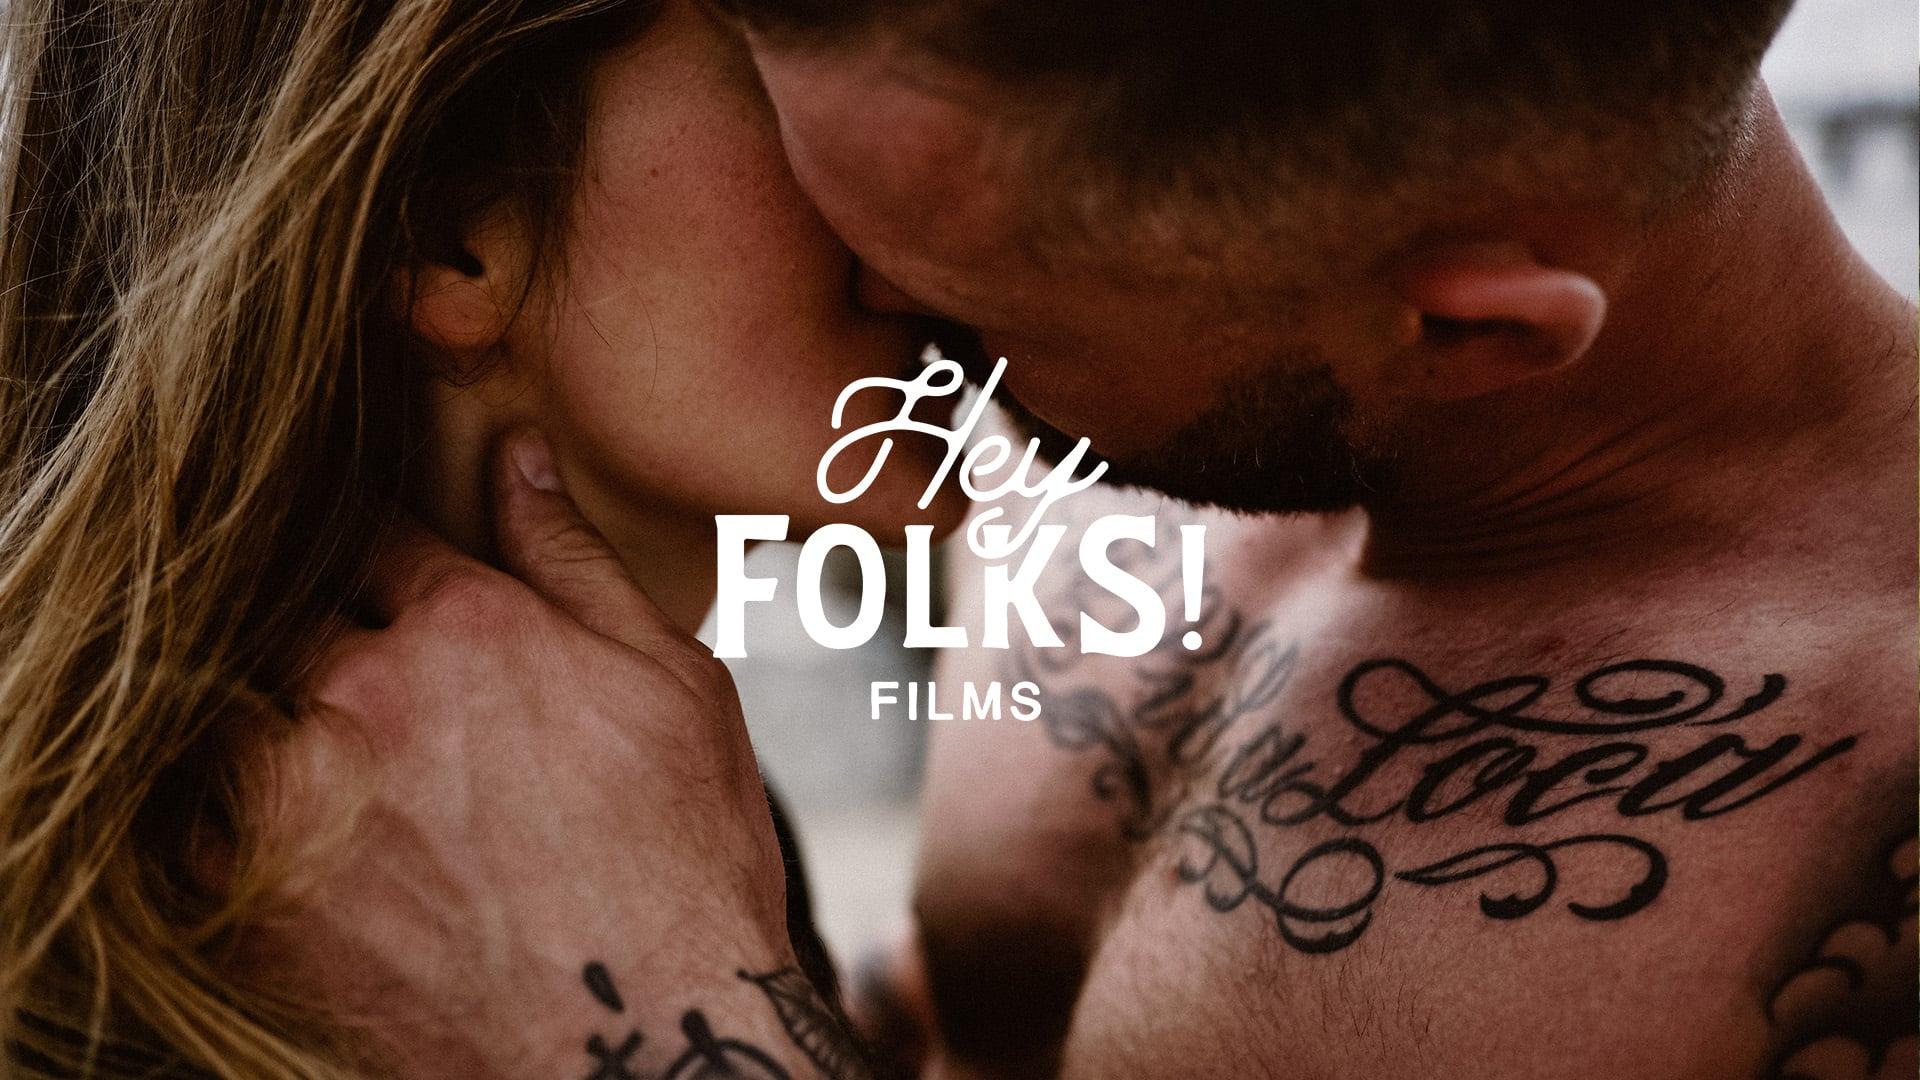 Hey Folks Films